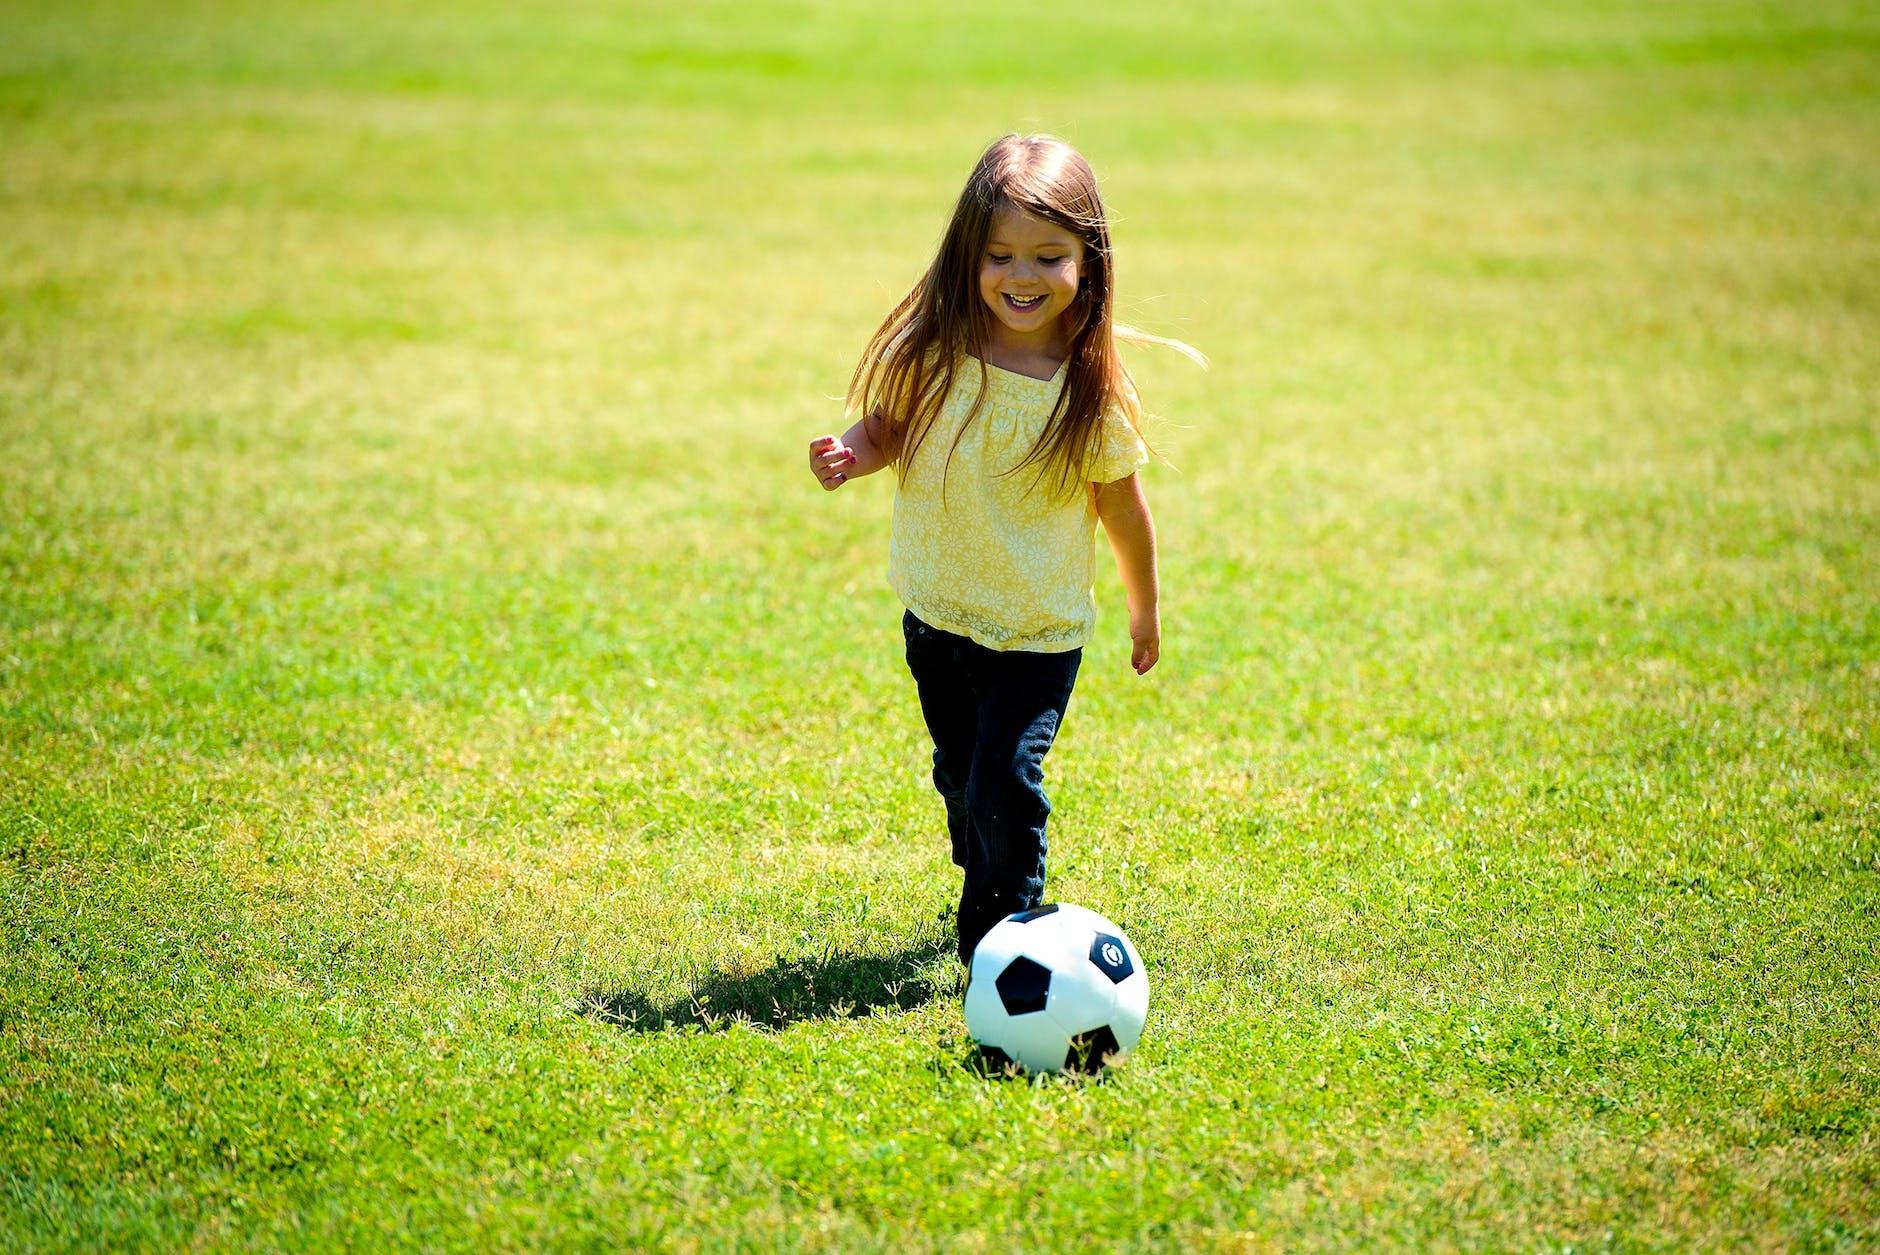 girl playing soccer - 960×640